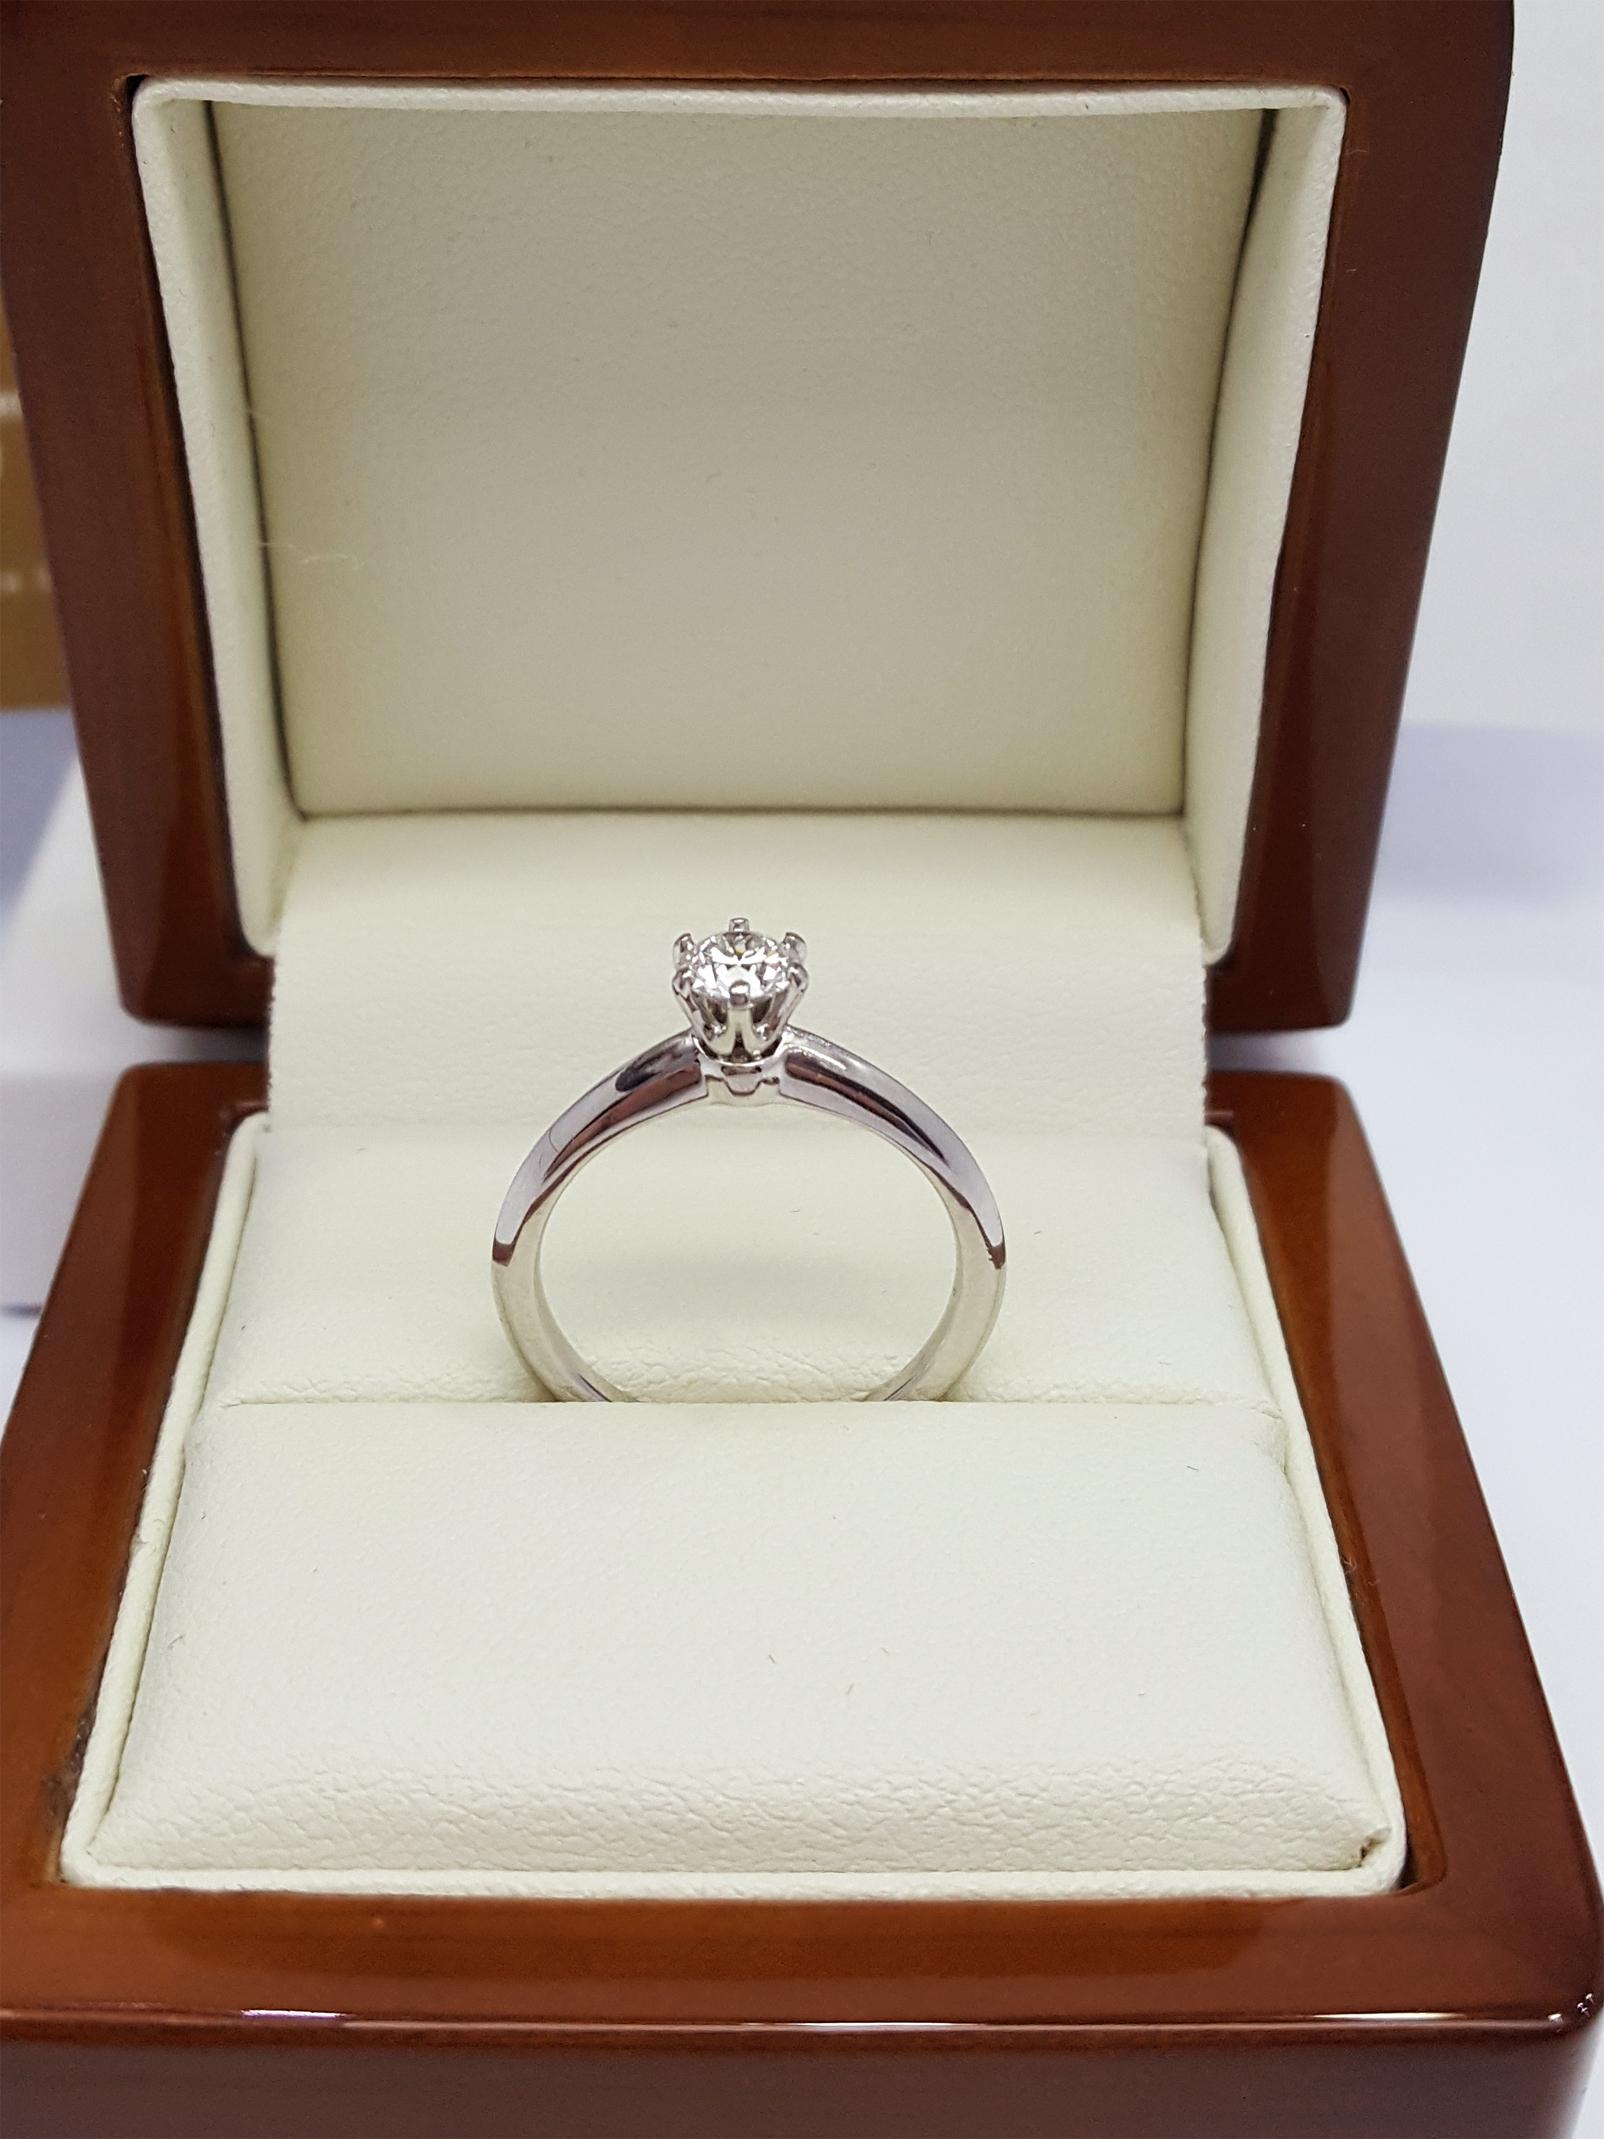 Inne rodzaje Skup biżuterii ze złota i srebra Warszawa - Lombard Artar S.C. RE96